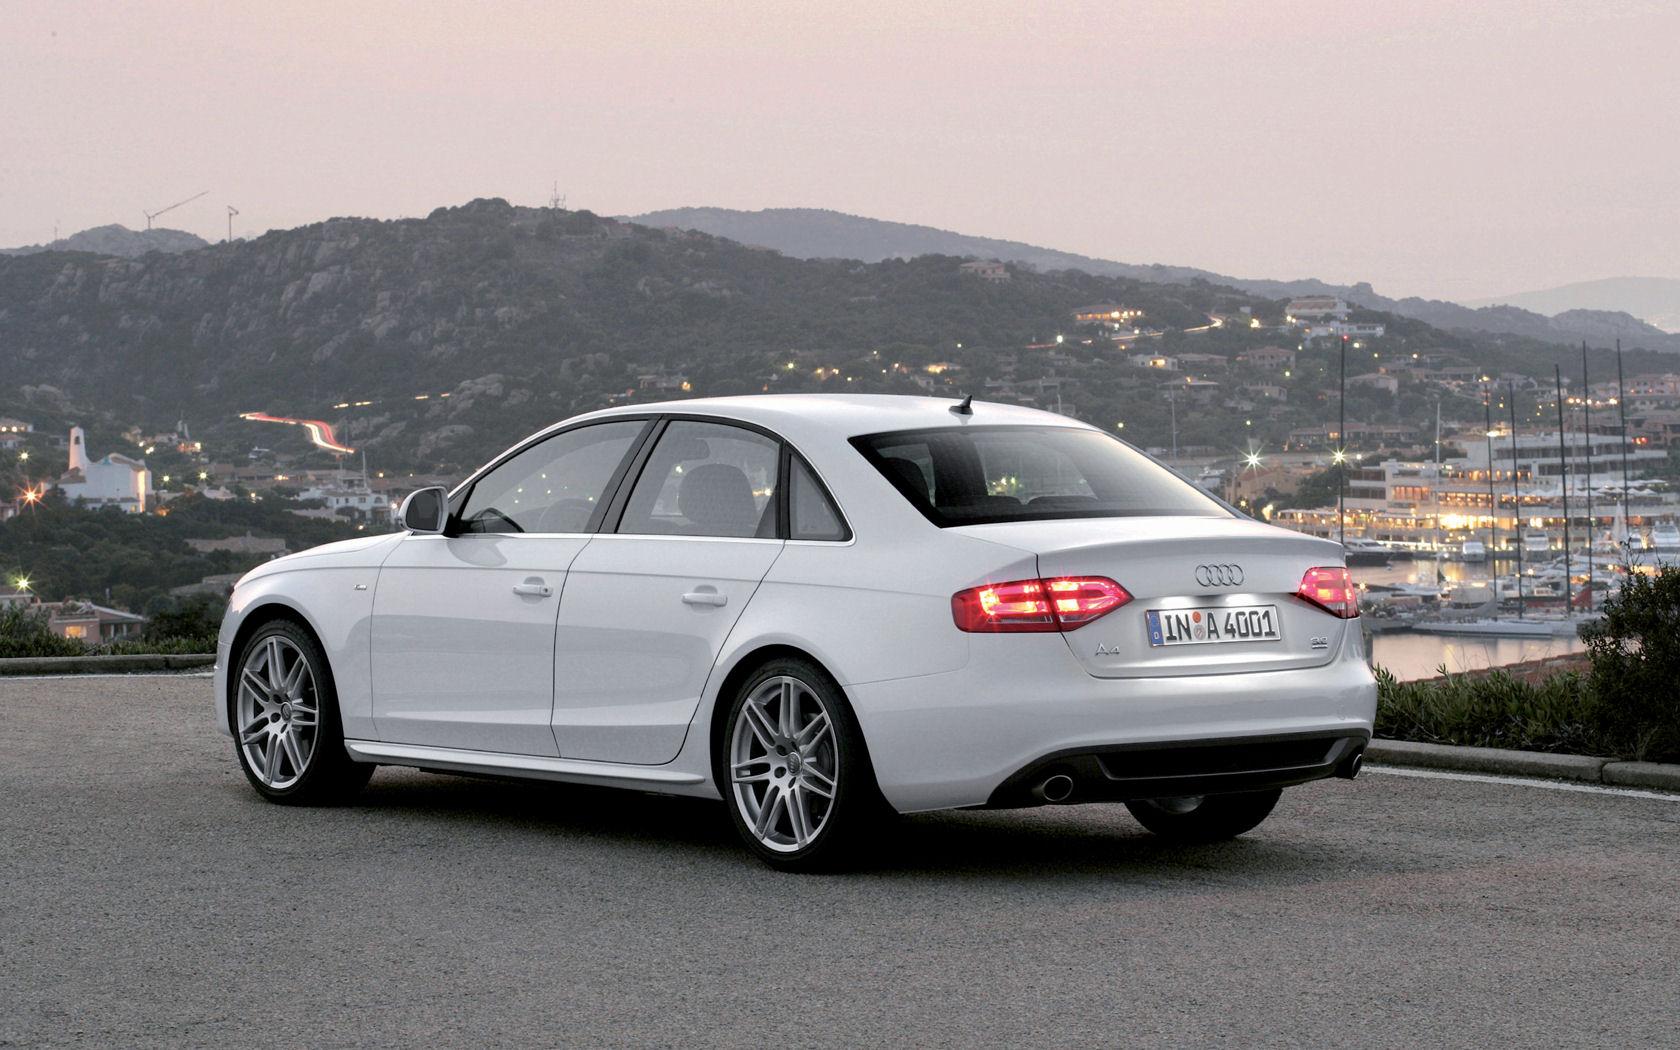 Audi A4 2 0t 3 2 S4 Quattro Avant Free Widescreen